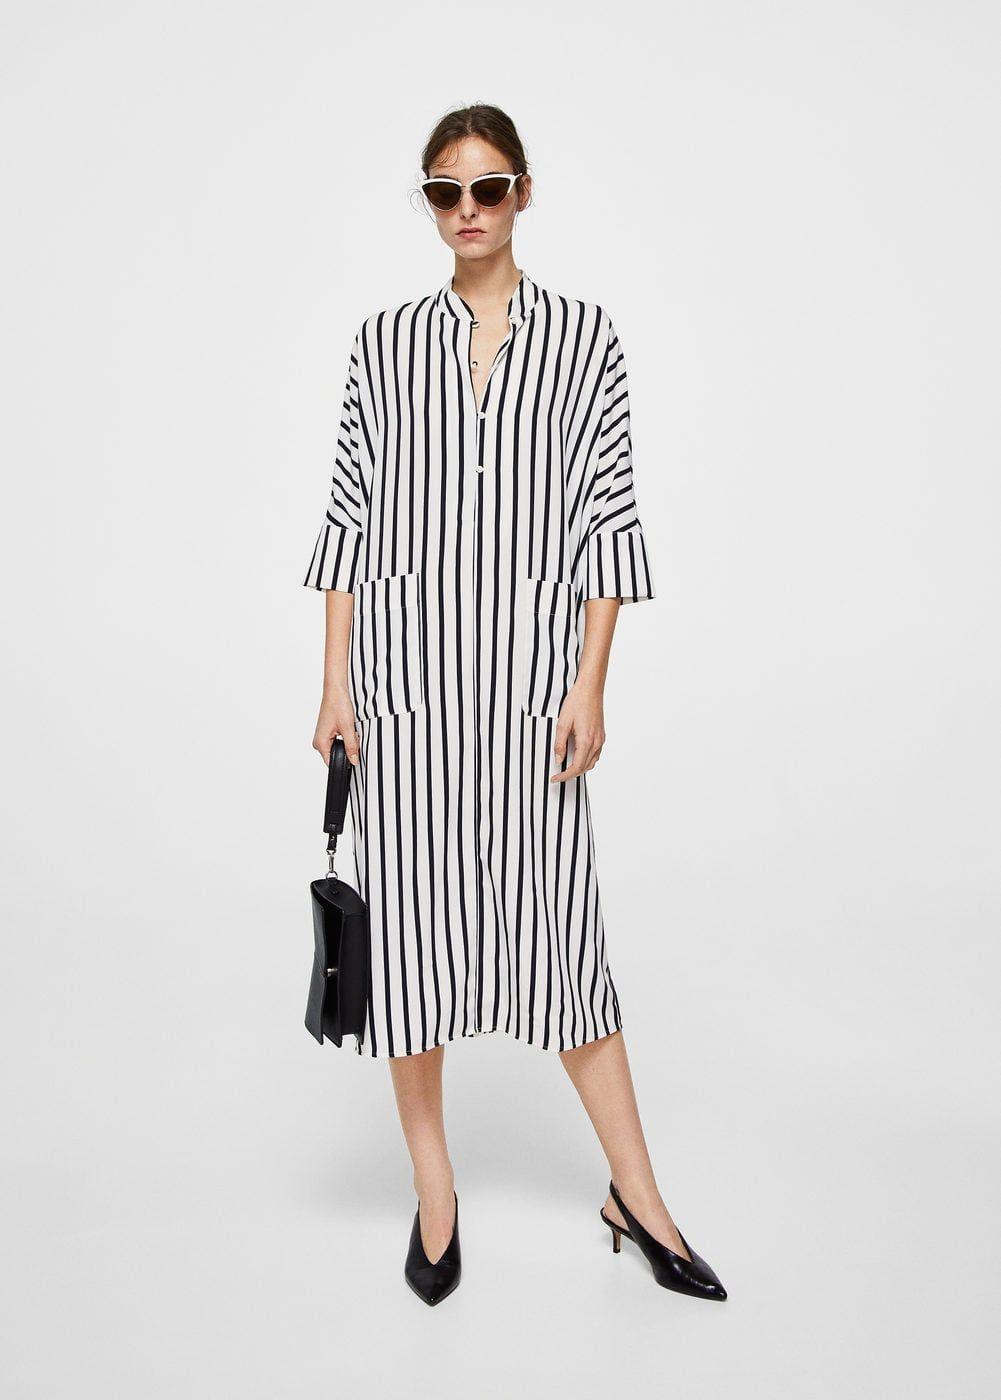 Cizgili Gomlek Elbise Kadin Mango Turkiye Striped Shirt Dress Shirt Dress Clothes